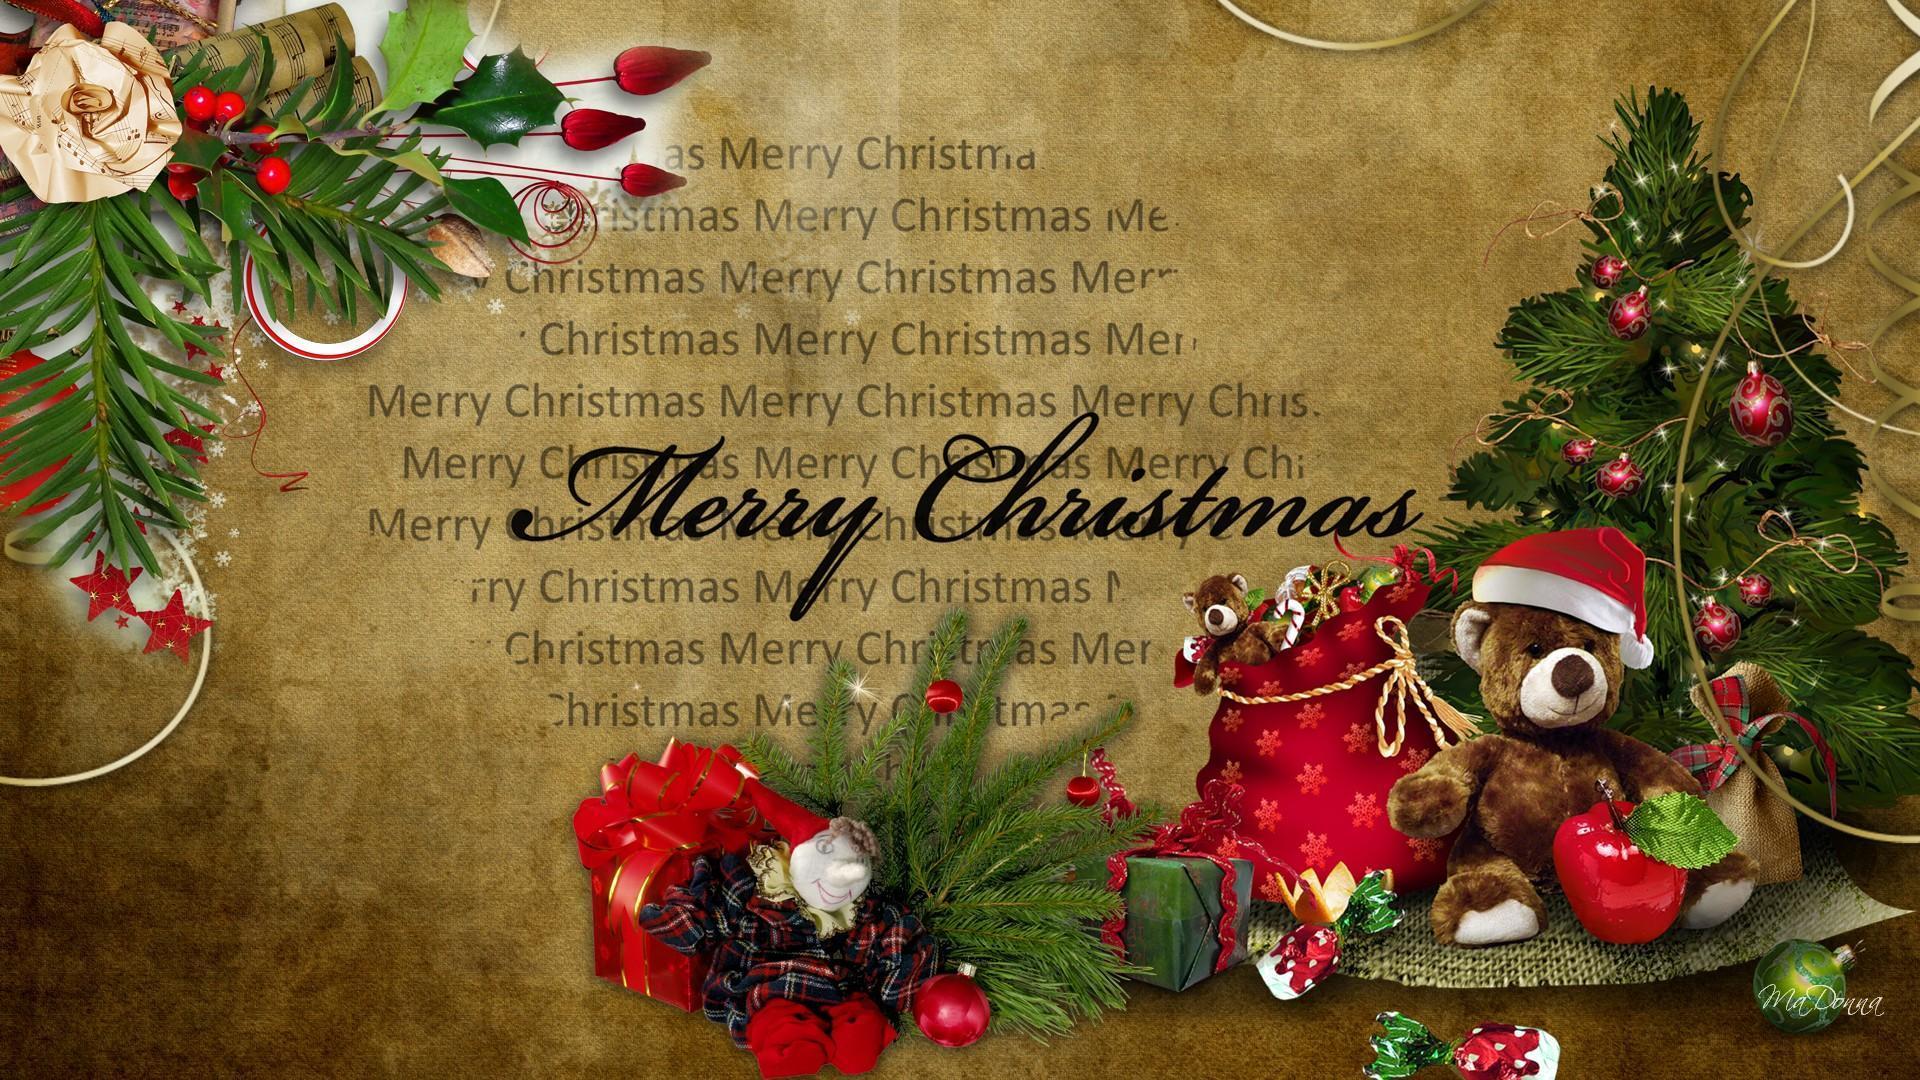 Vintage Look Christmas Vintage Old Fashioned Christmas Backgrounds 1920x1080 Wallpaper Teahub Io